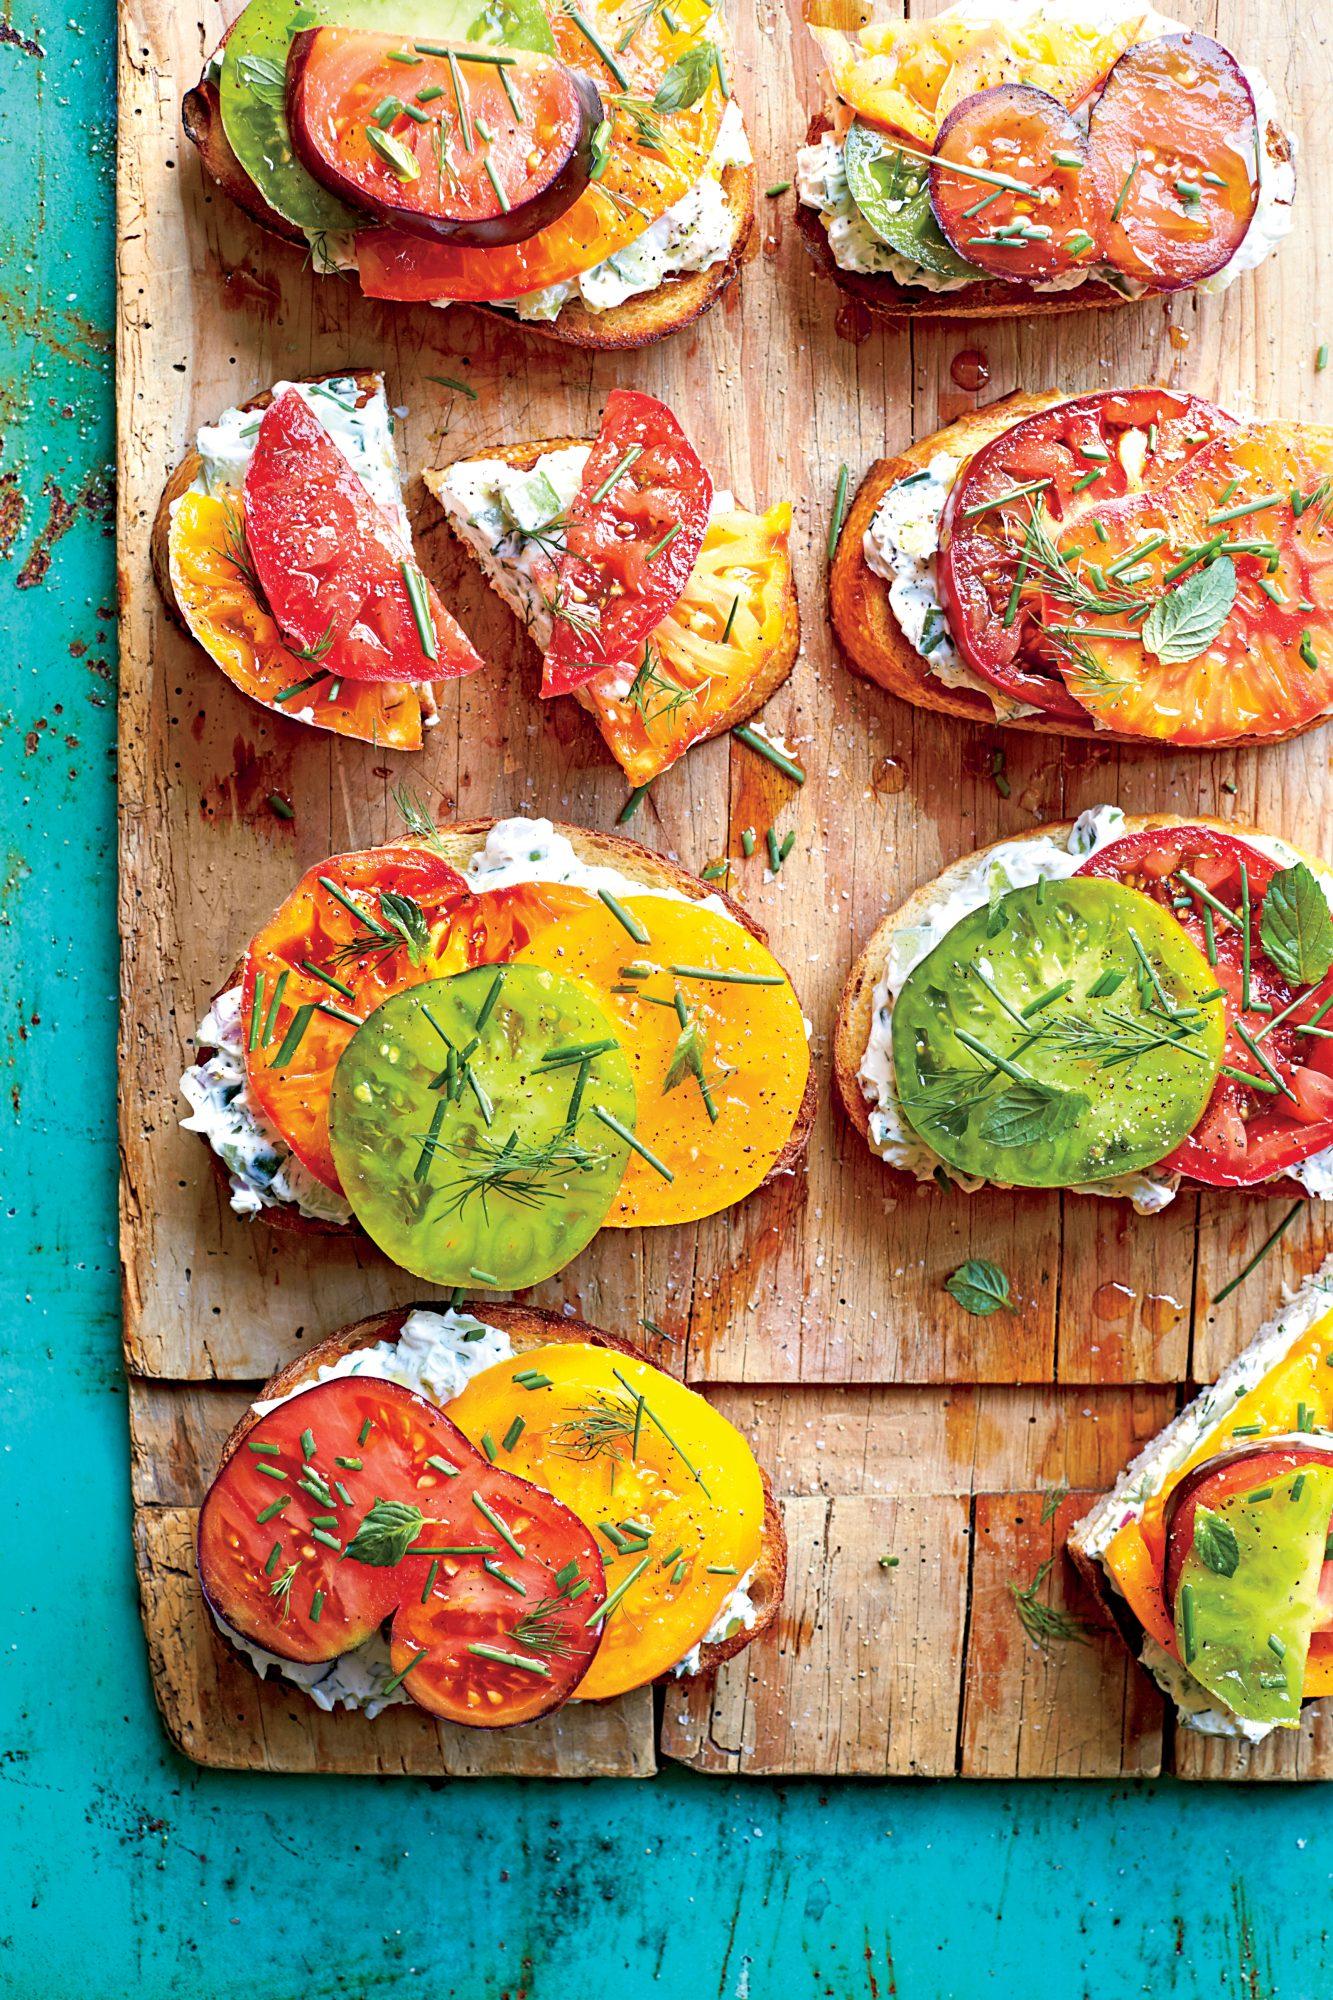 Open-Faced Tomato Sandwiches with Creamy Cucumber Spread